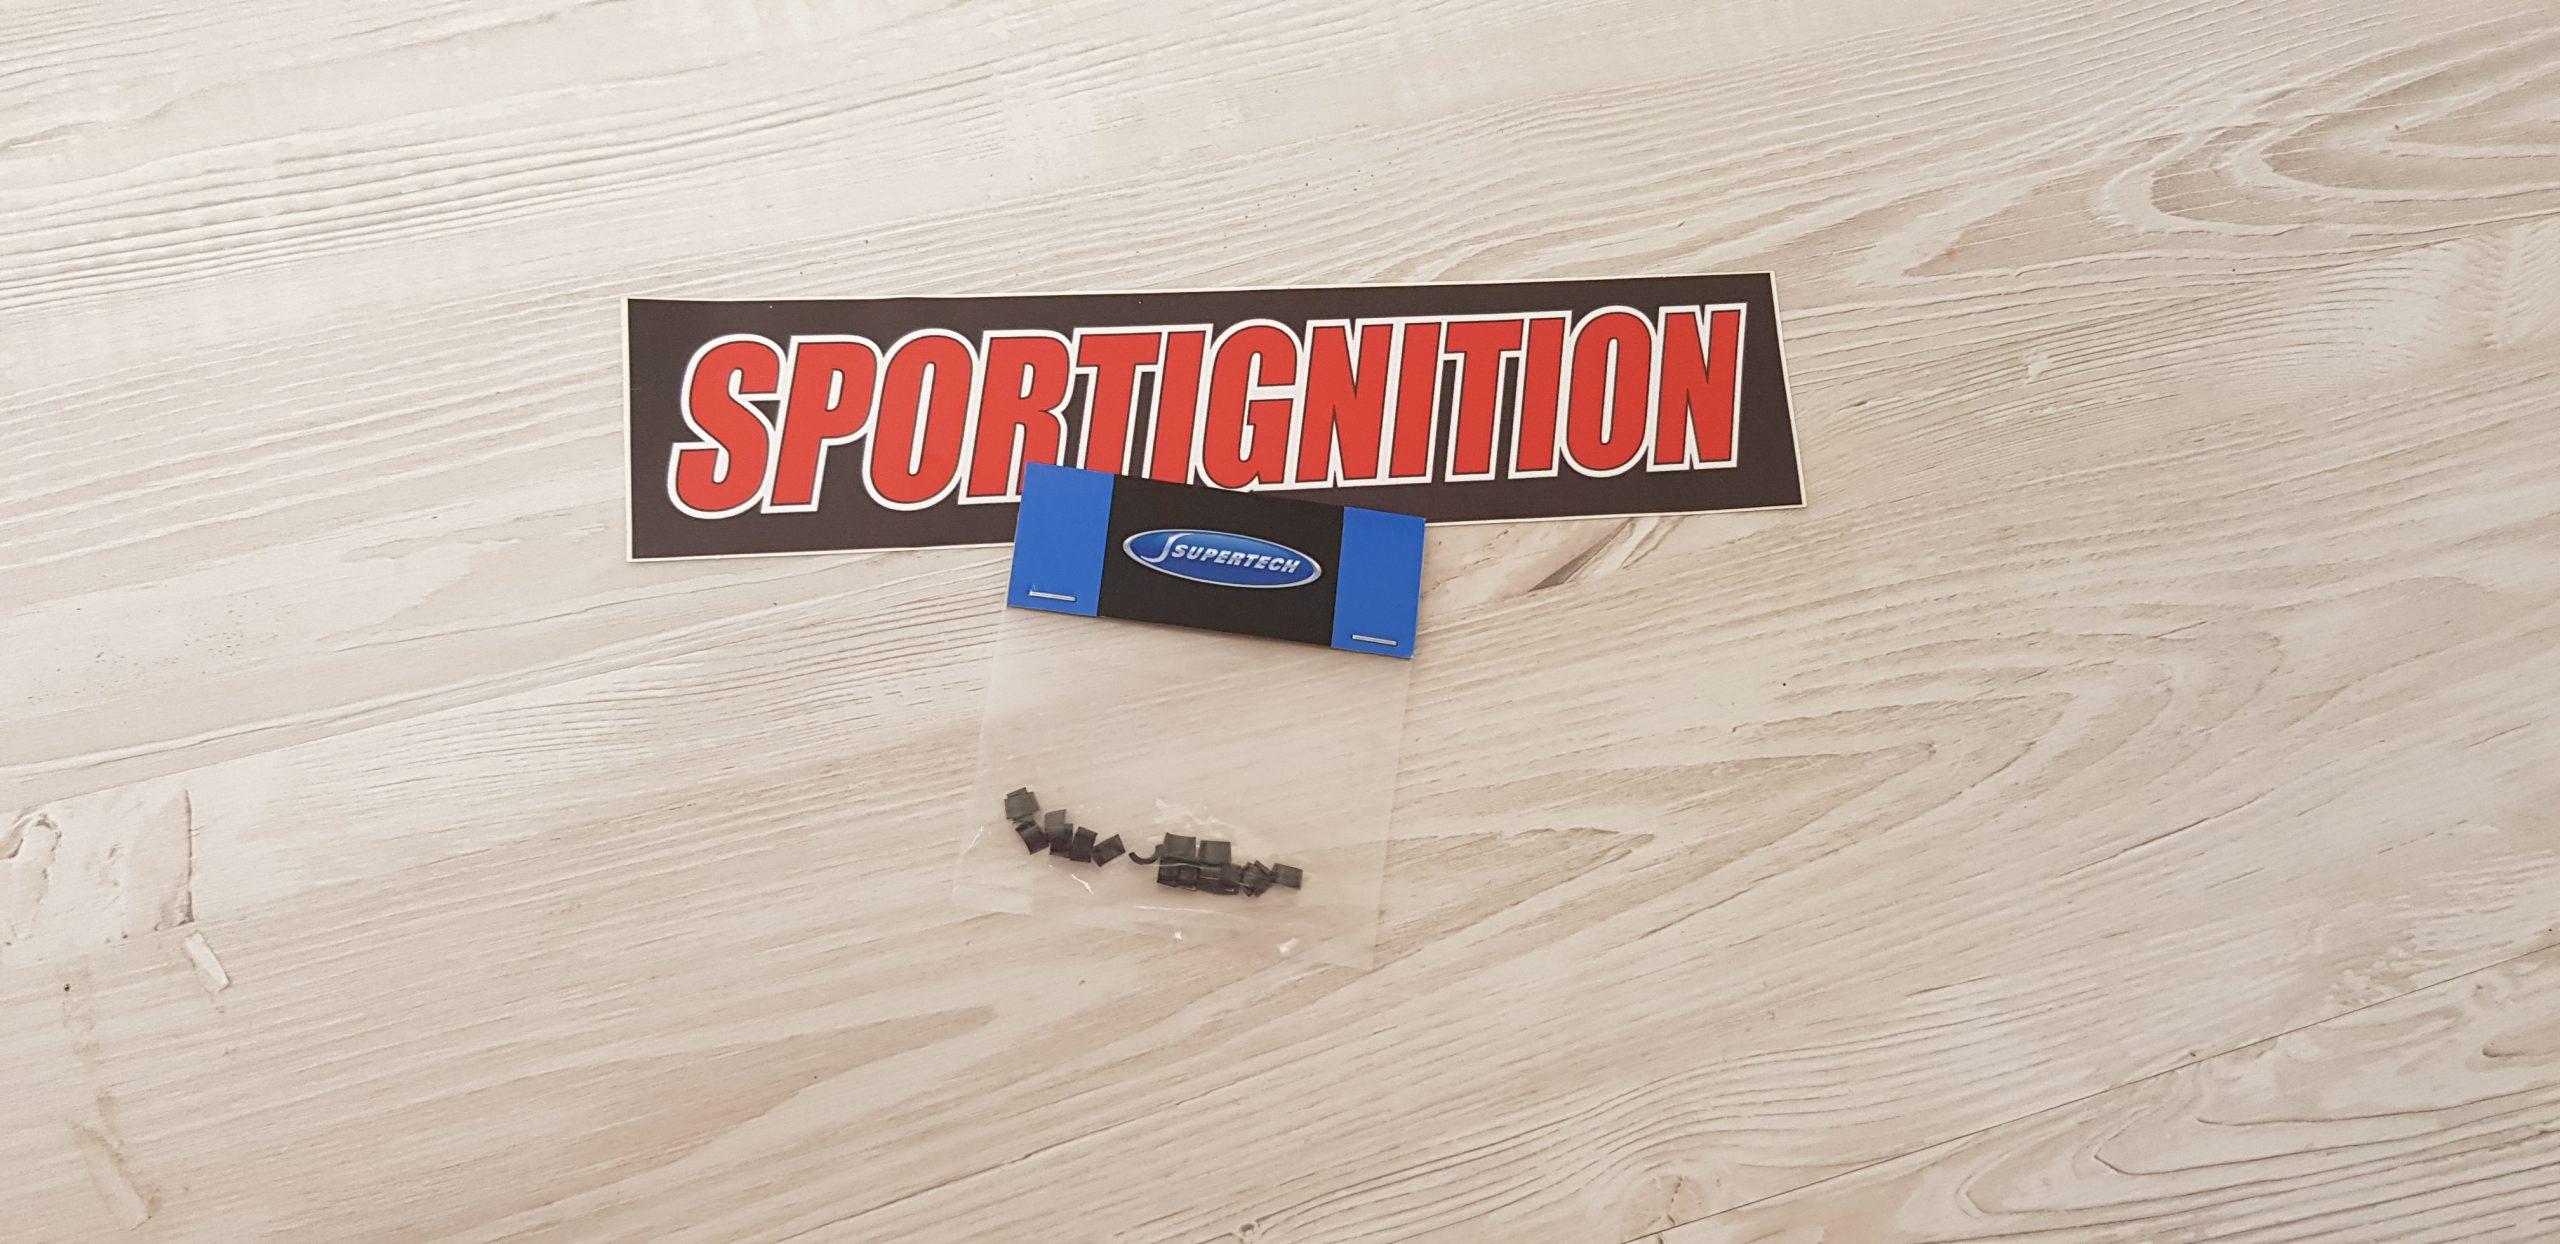 keepers subaru Mini Sportigntion Brz